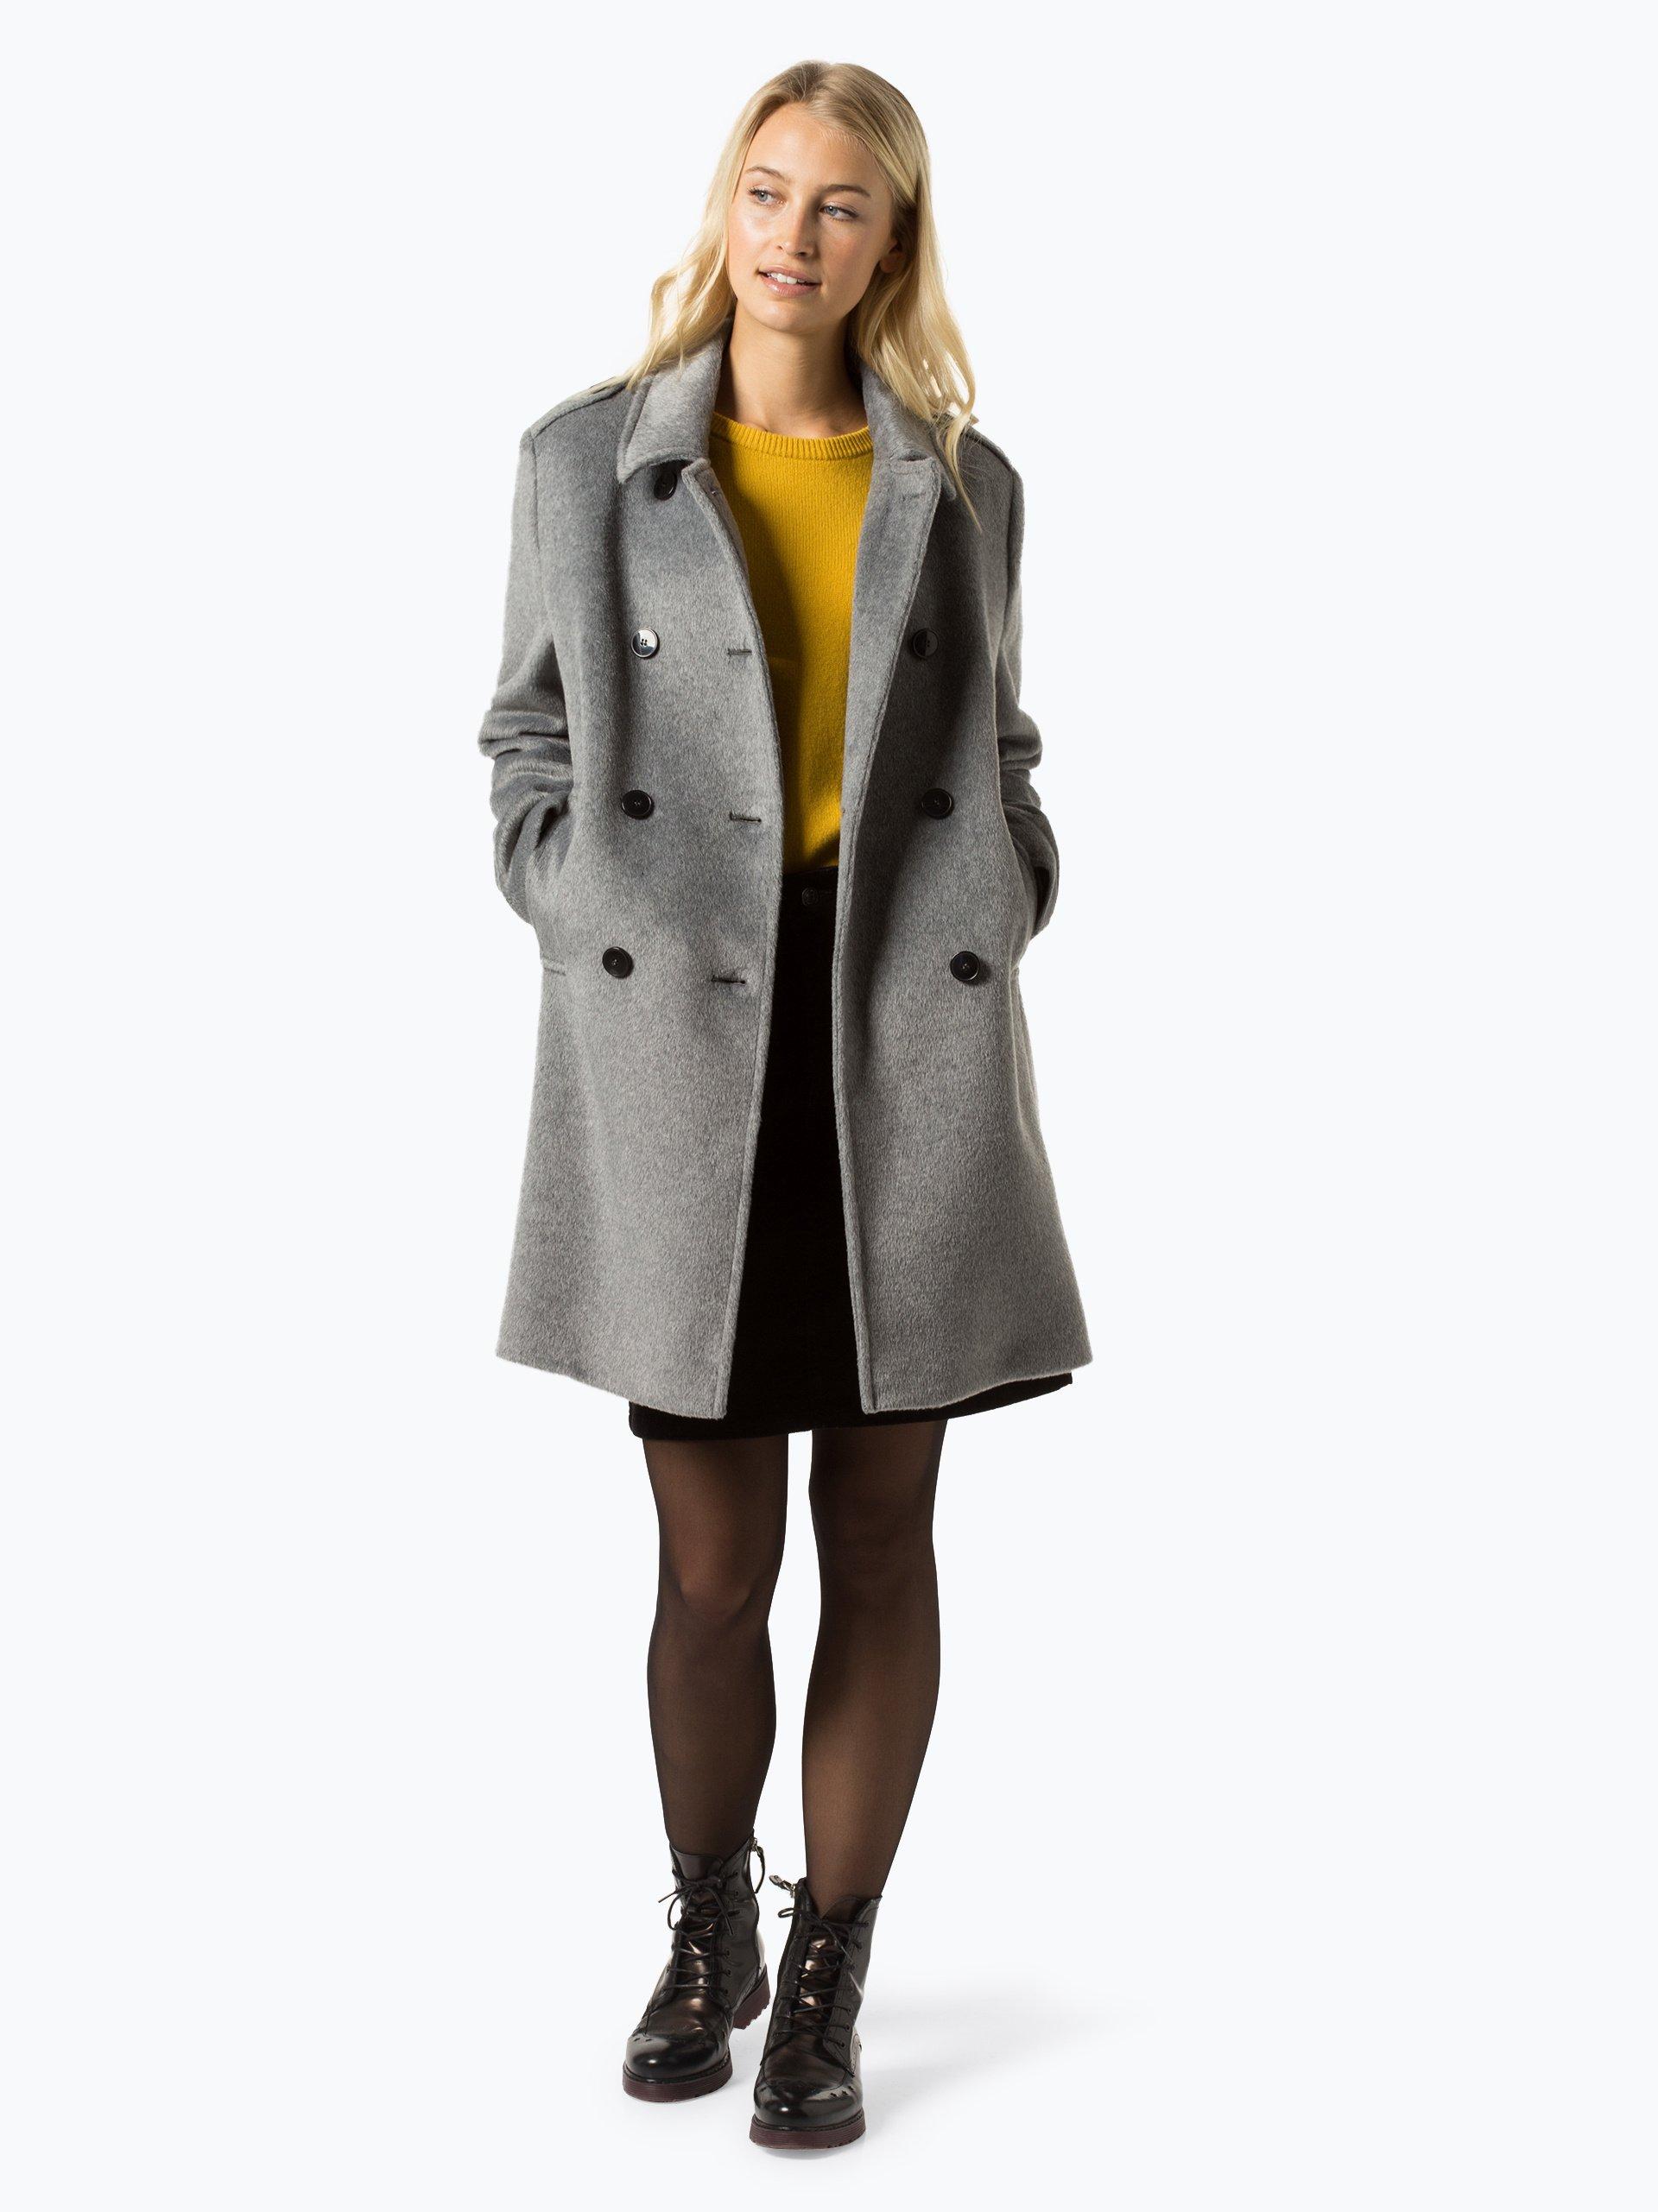 fuchs schmitt damen mantel grau uni online kaufen peek und cloppenburg de. Black Bedroom Furniture Sets. Home Design Ideas